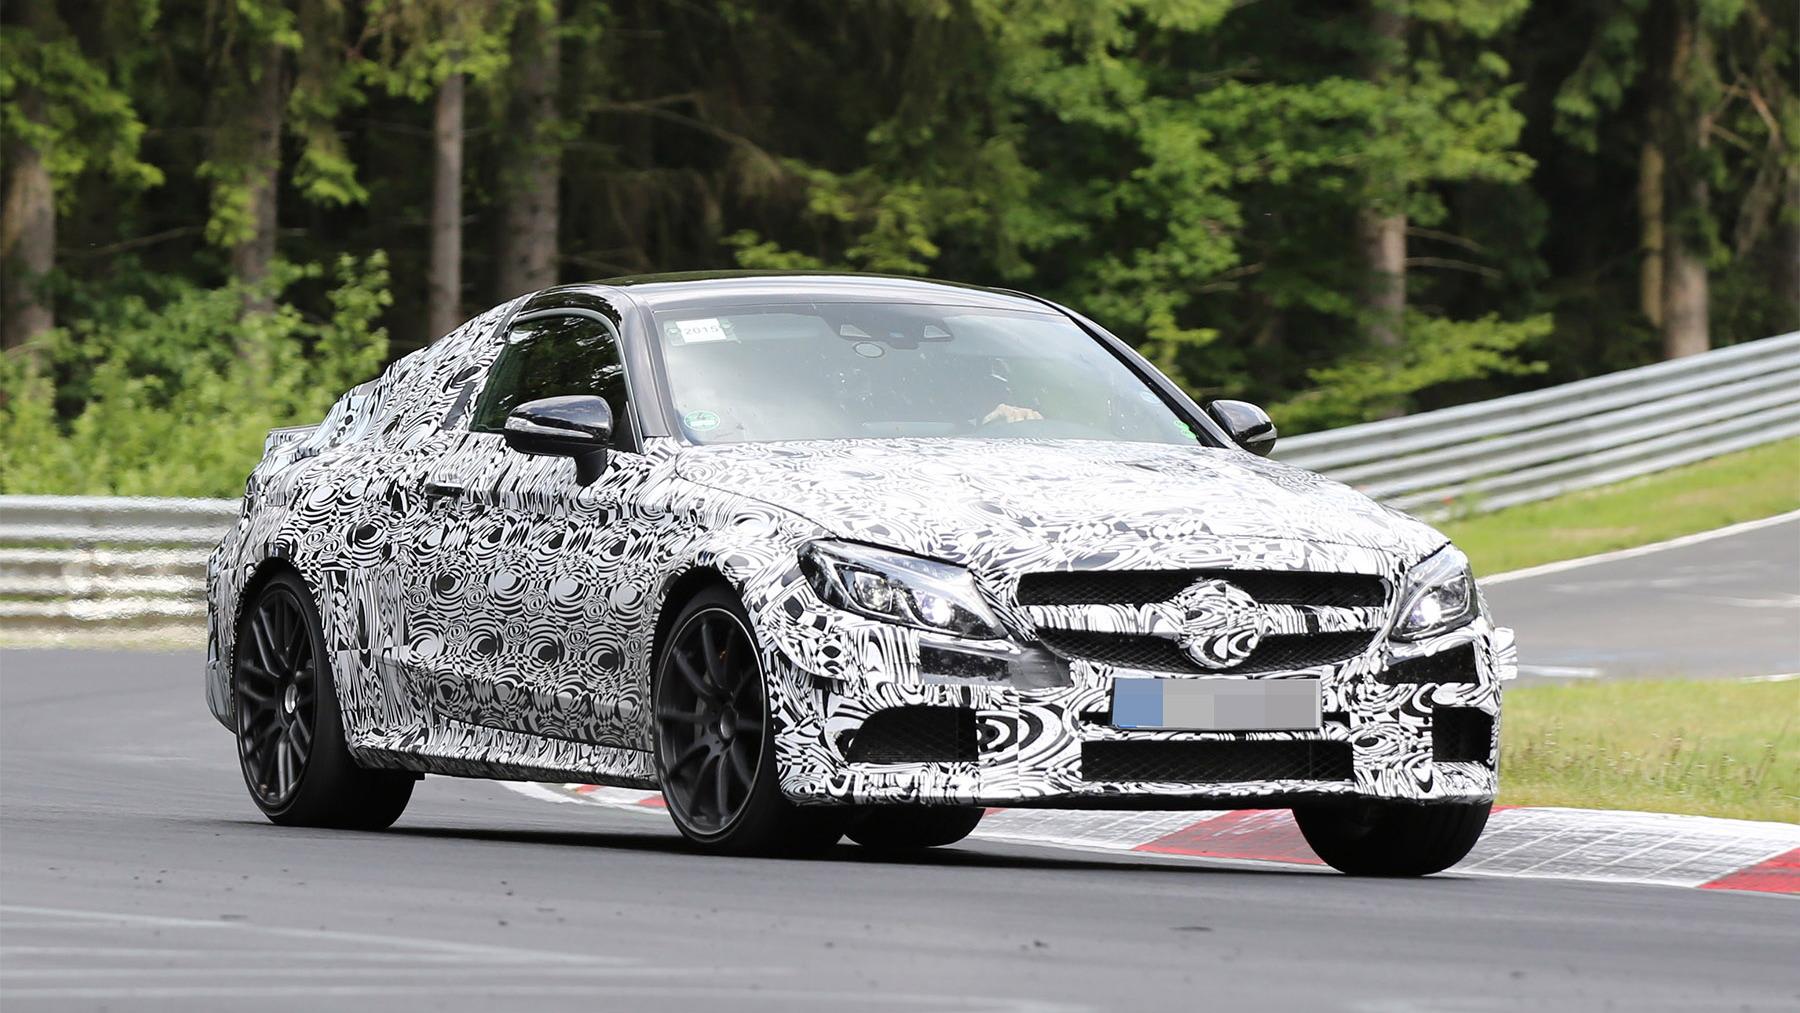 2017 Mercedes-AMG C63 Coupe spy shots - Image via S. Baldauf/SB-Medien